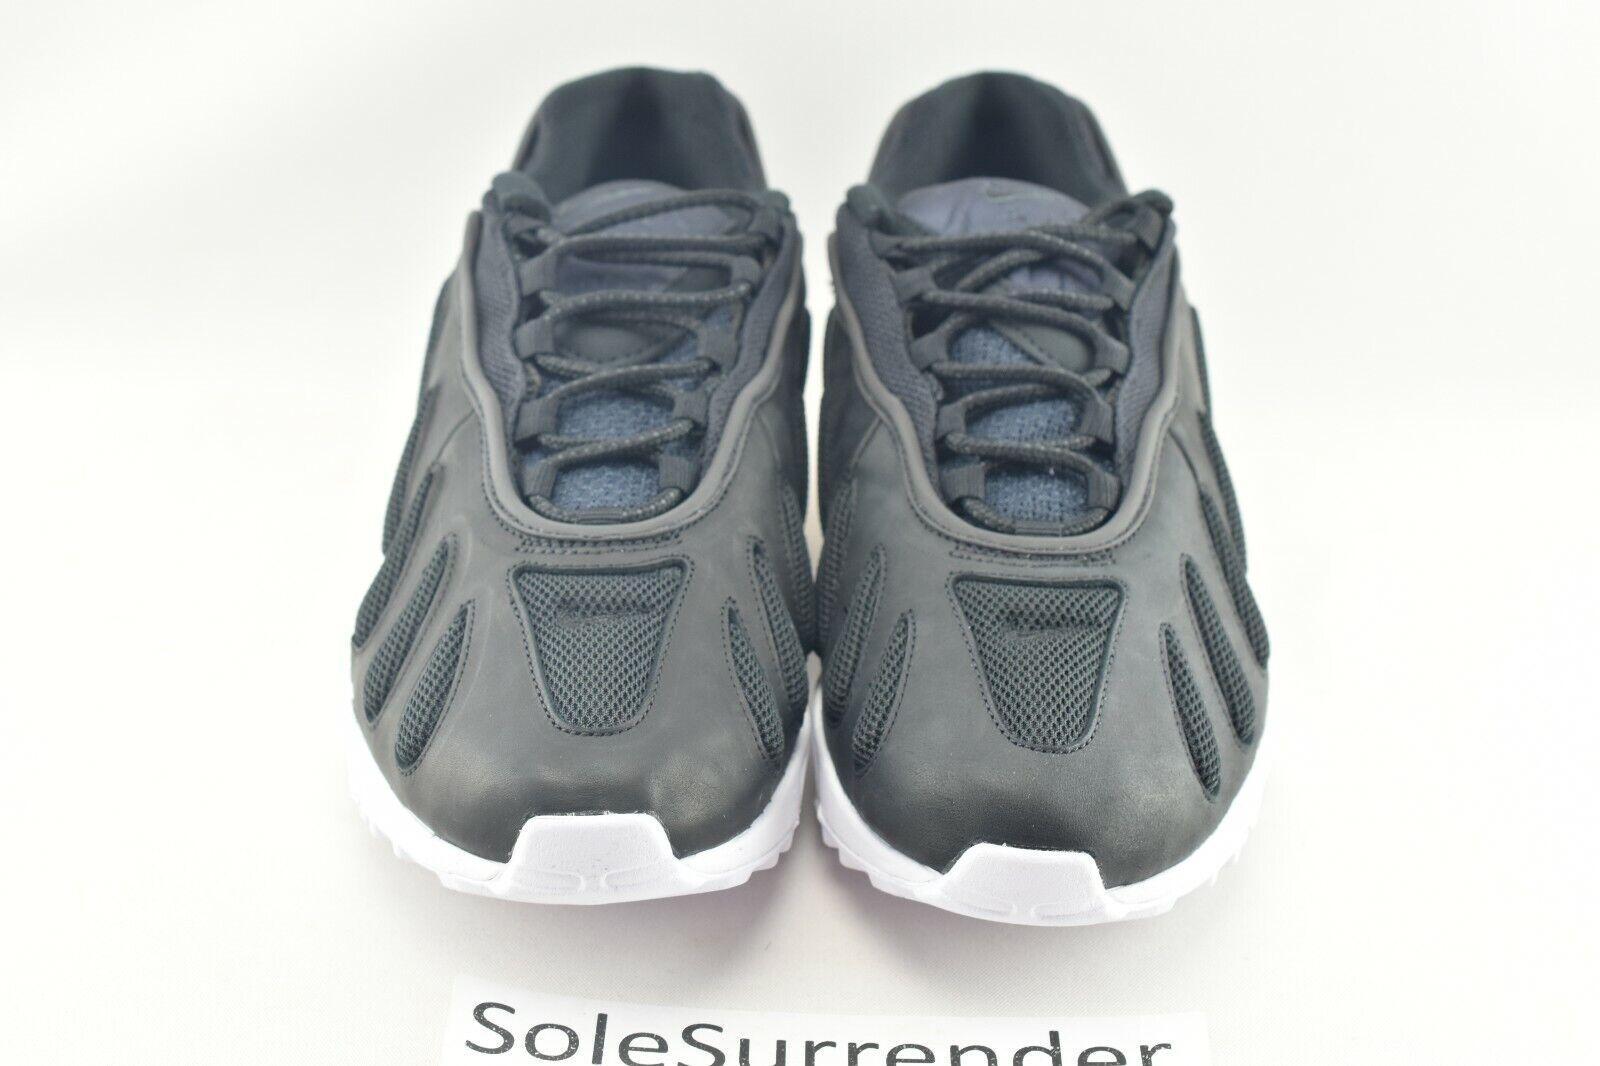 NikeLab Air Max 96 XX XX XX - SIZE 10 - NEW - 870165-002 Black White Lab 20 Retro QS e4a7be